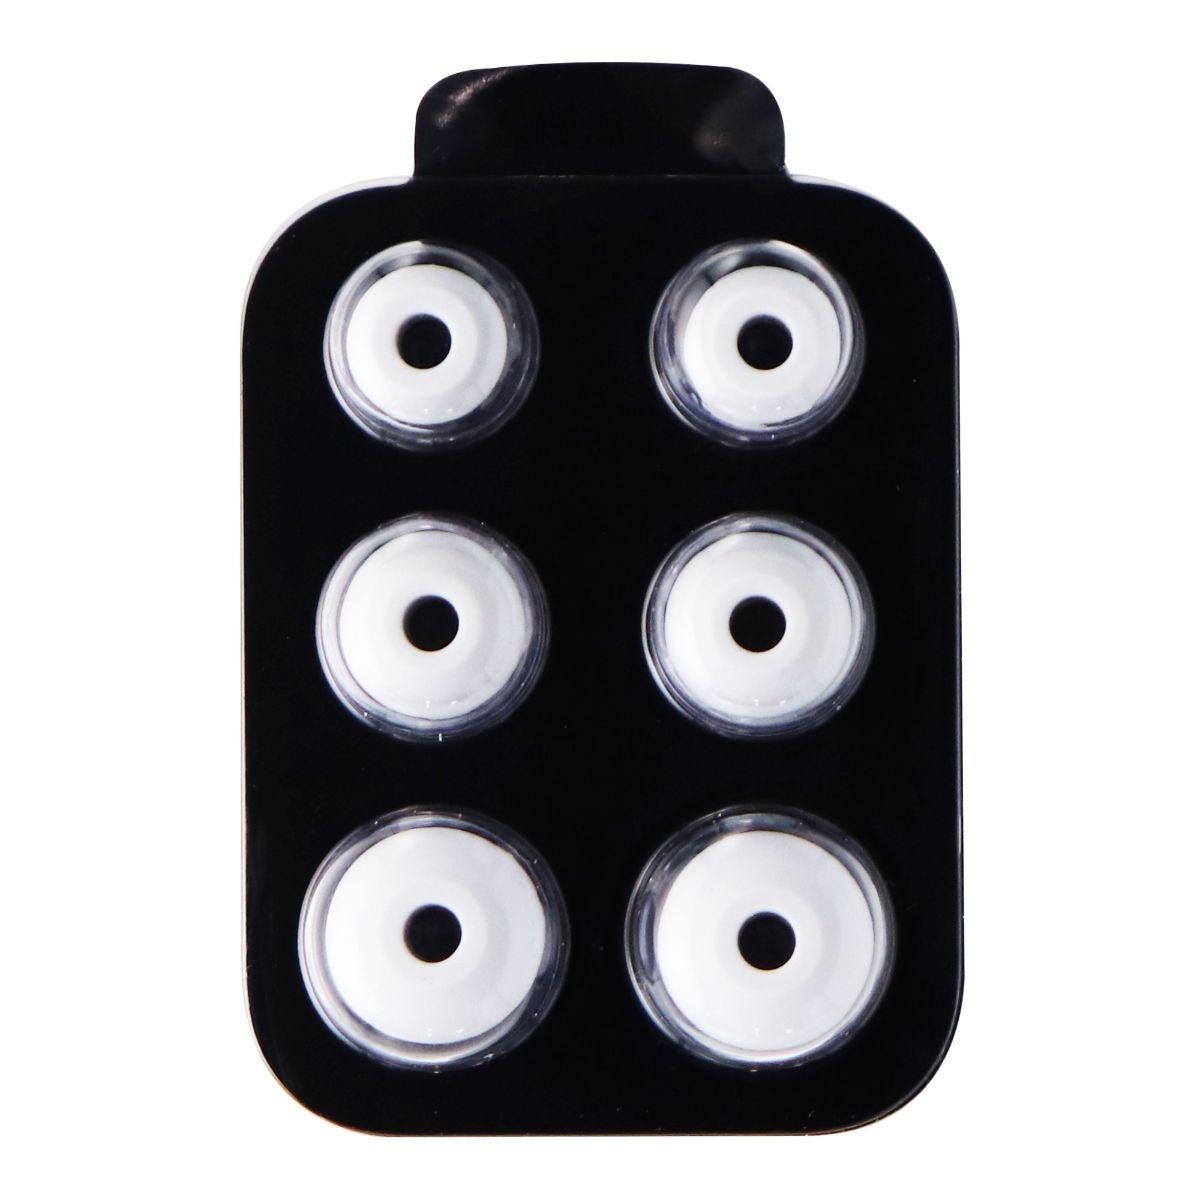 Genuine Beats Replacement Ear Gels for BeatsX Headphones - Matte Silver